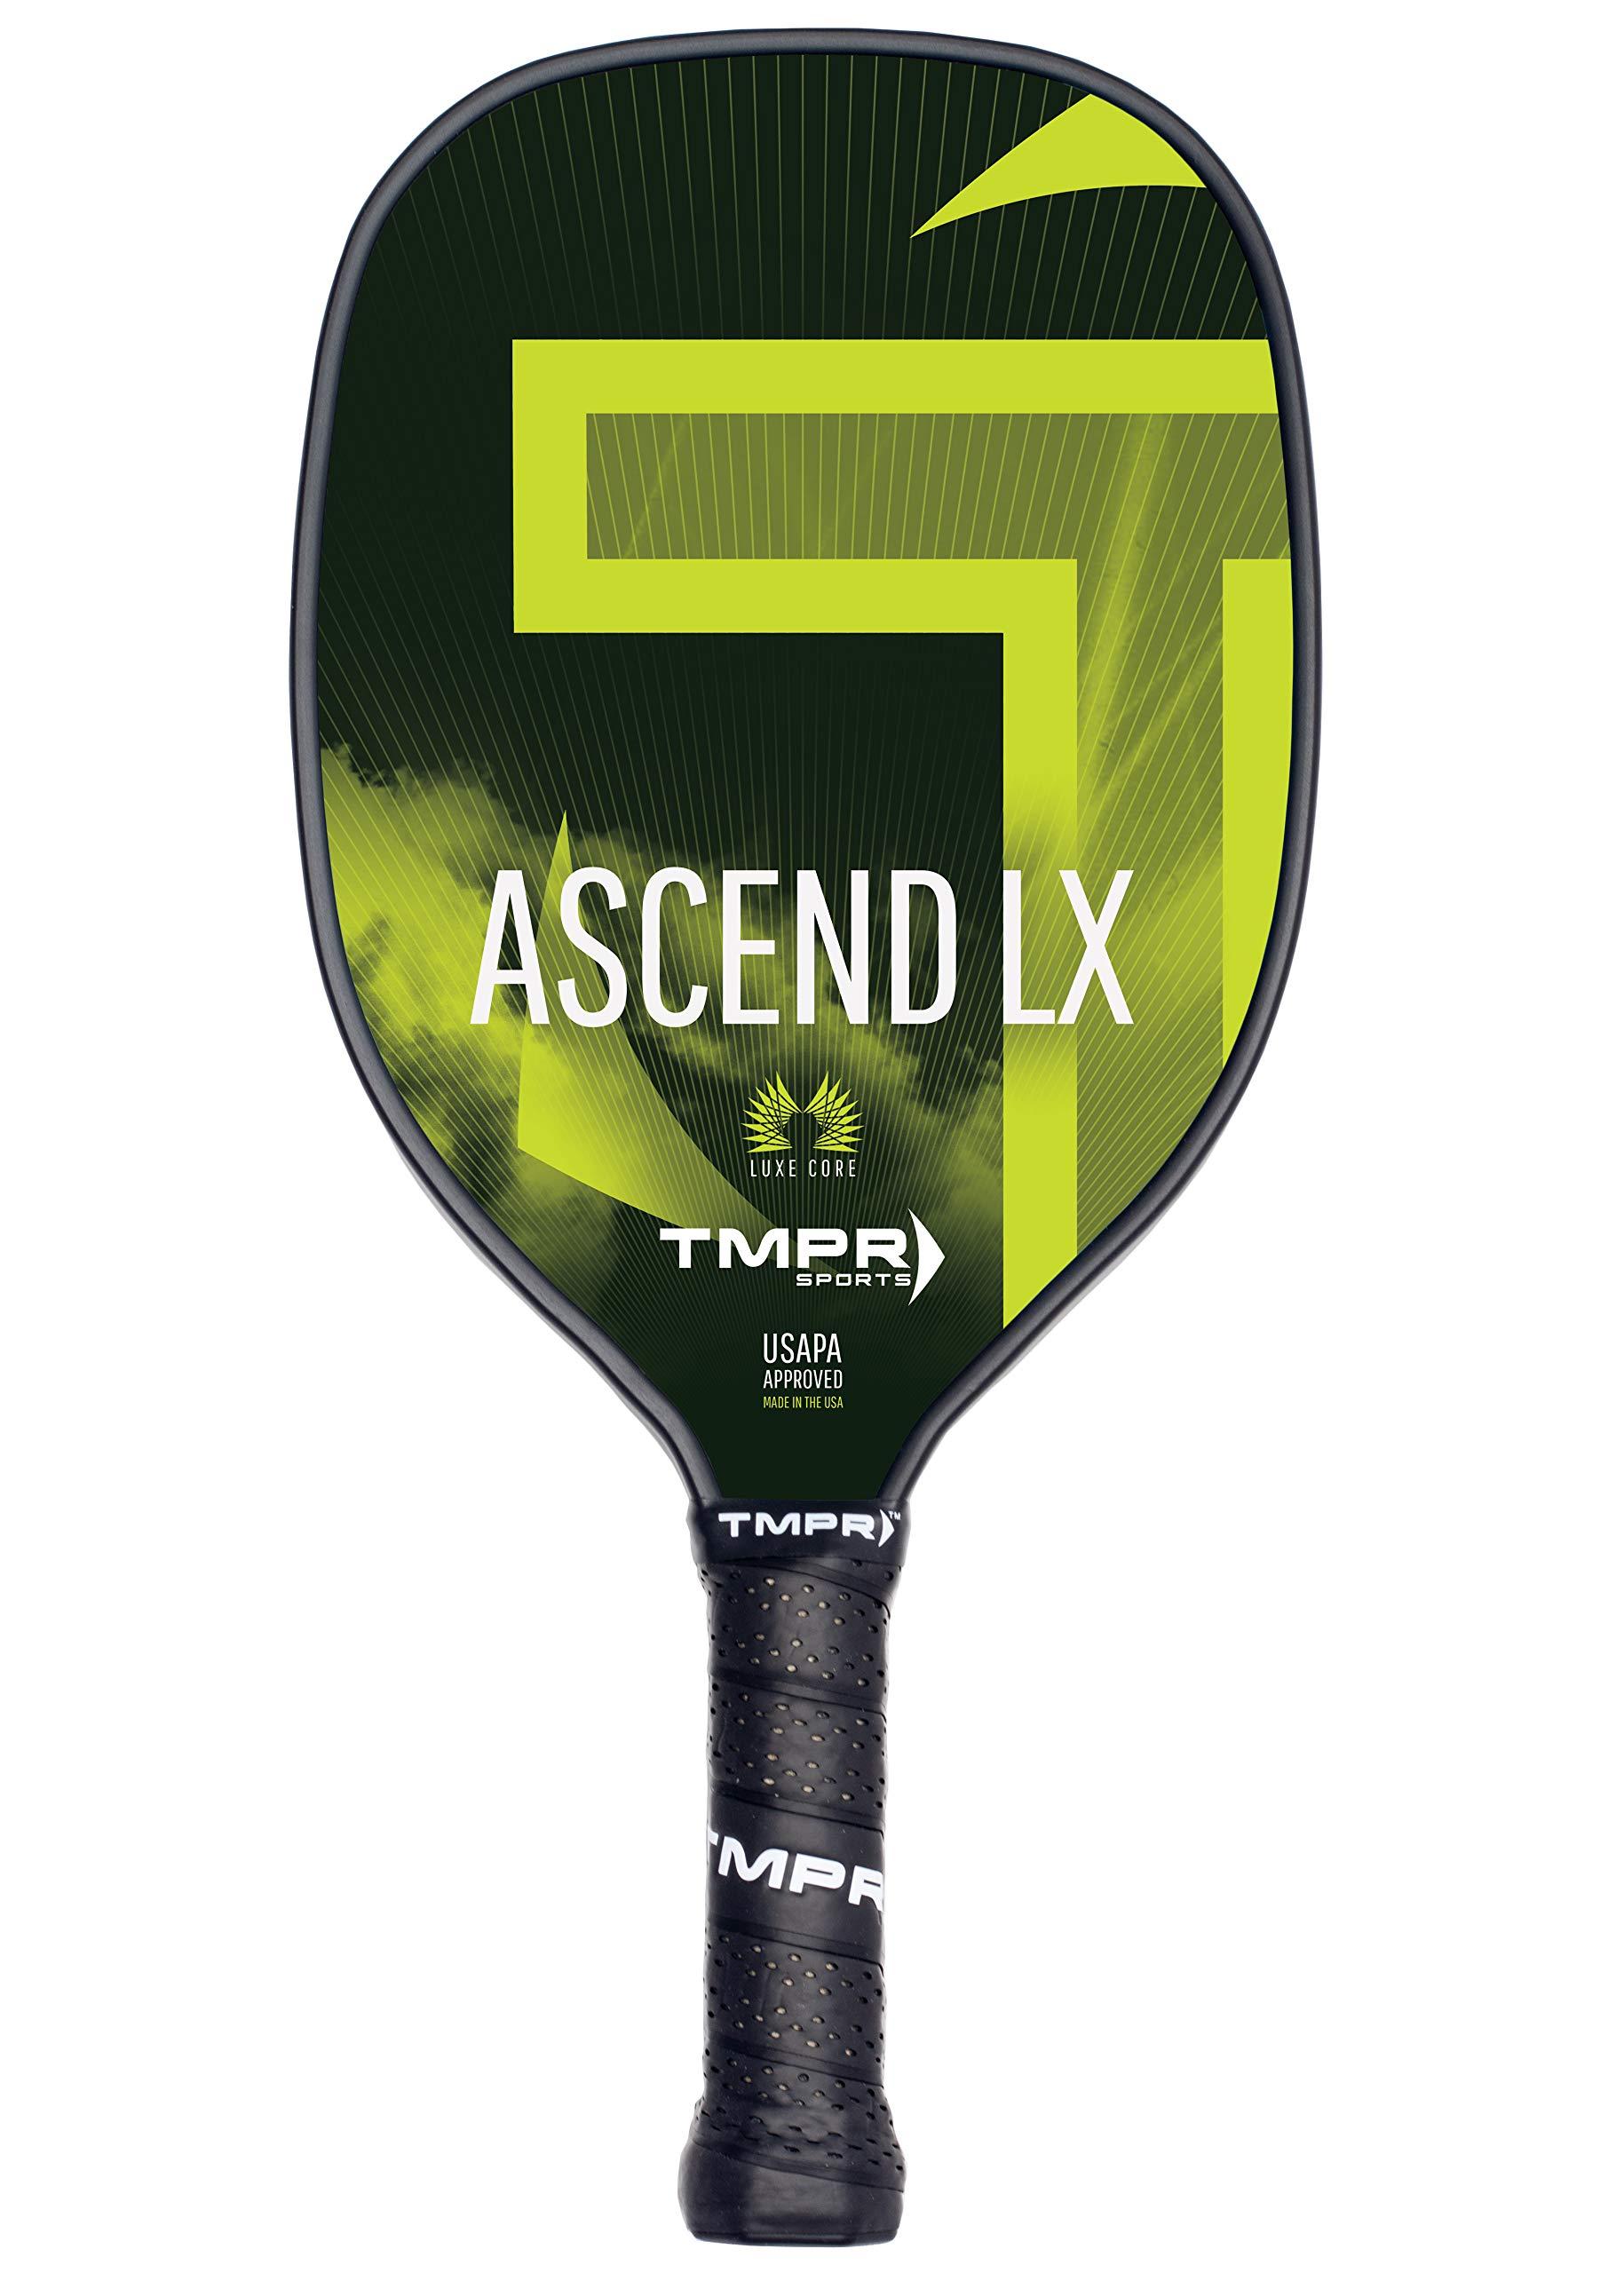 TMPR Sports > Ascend LX > Honeycomb Polymer Pickleball -DW5C